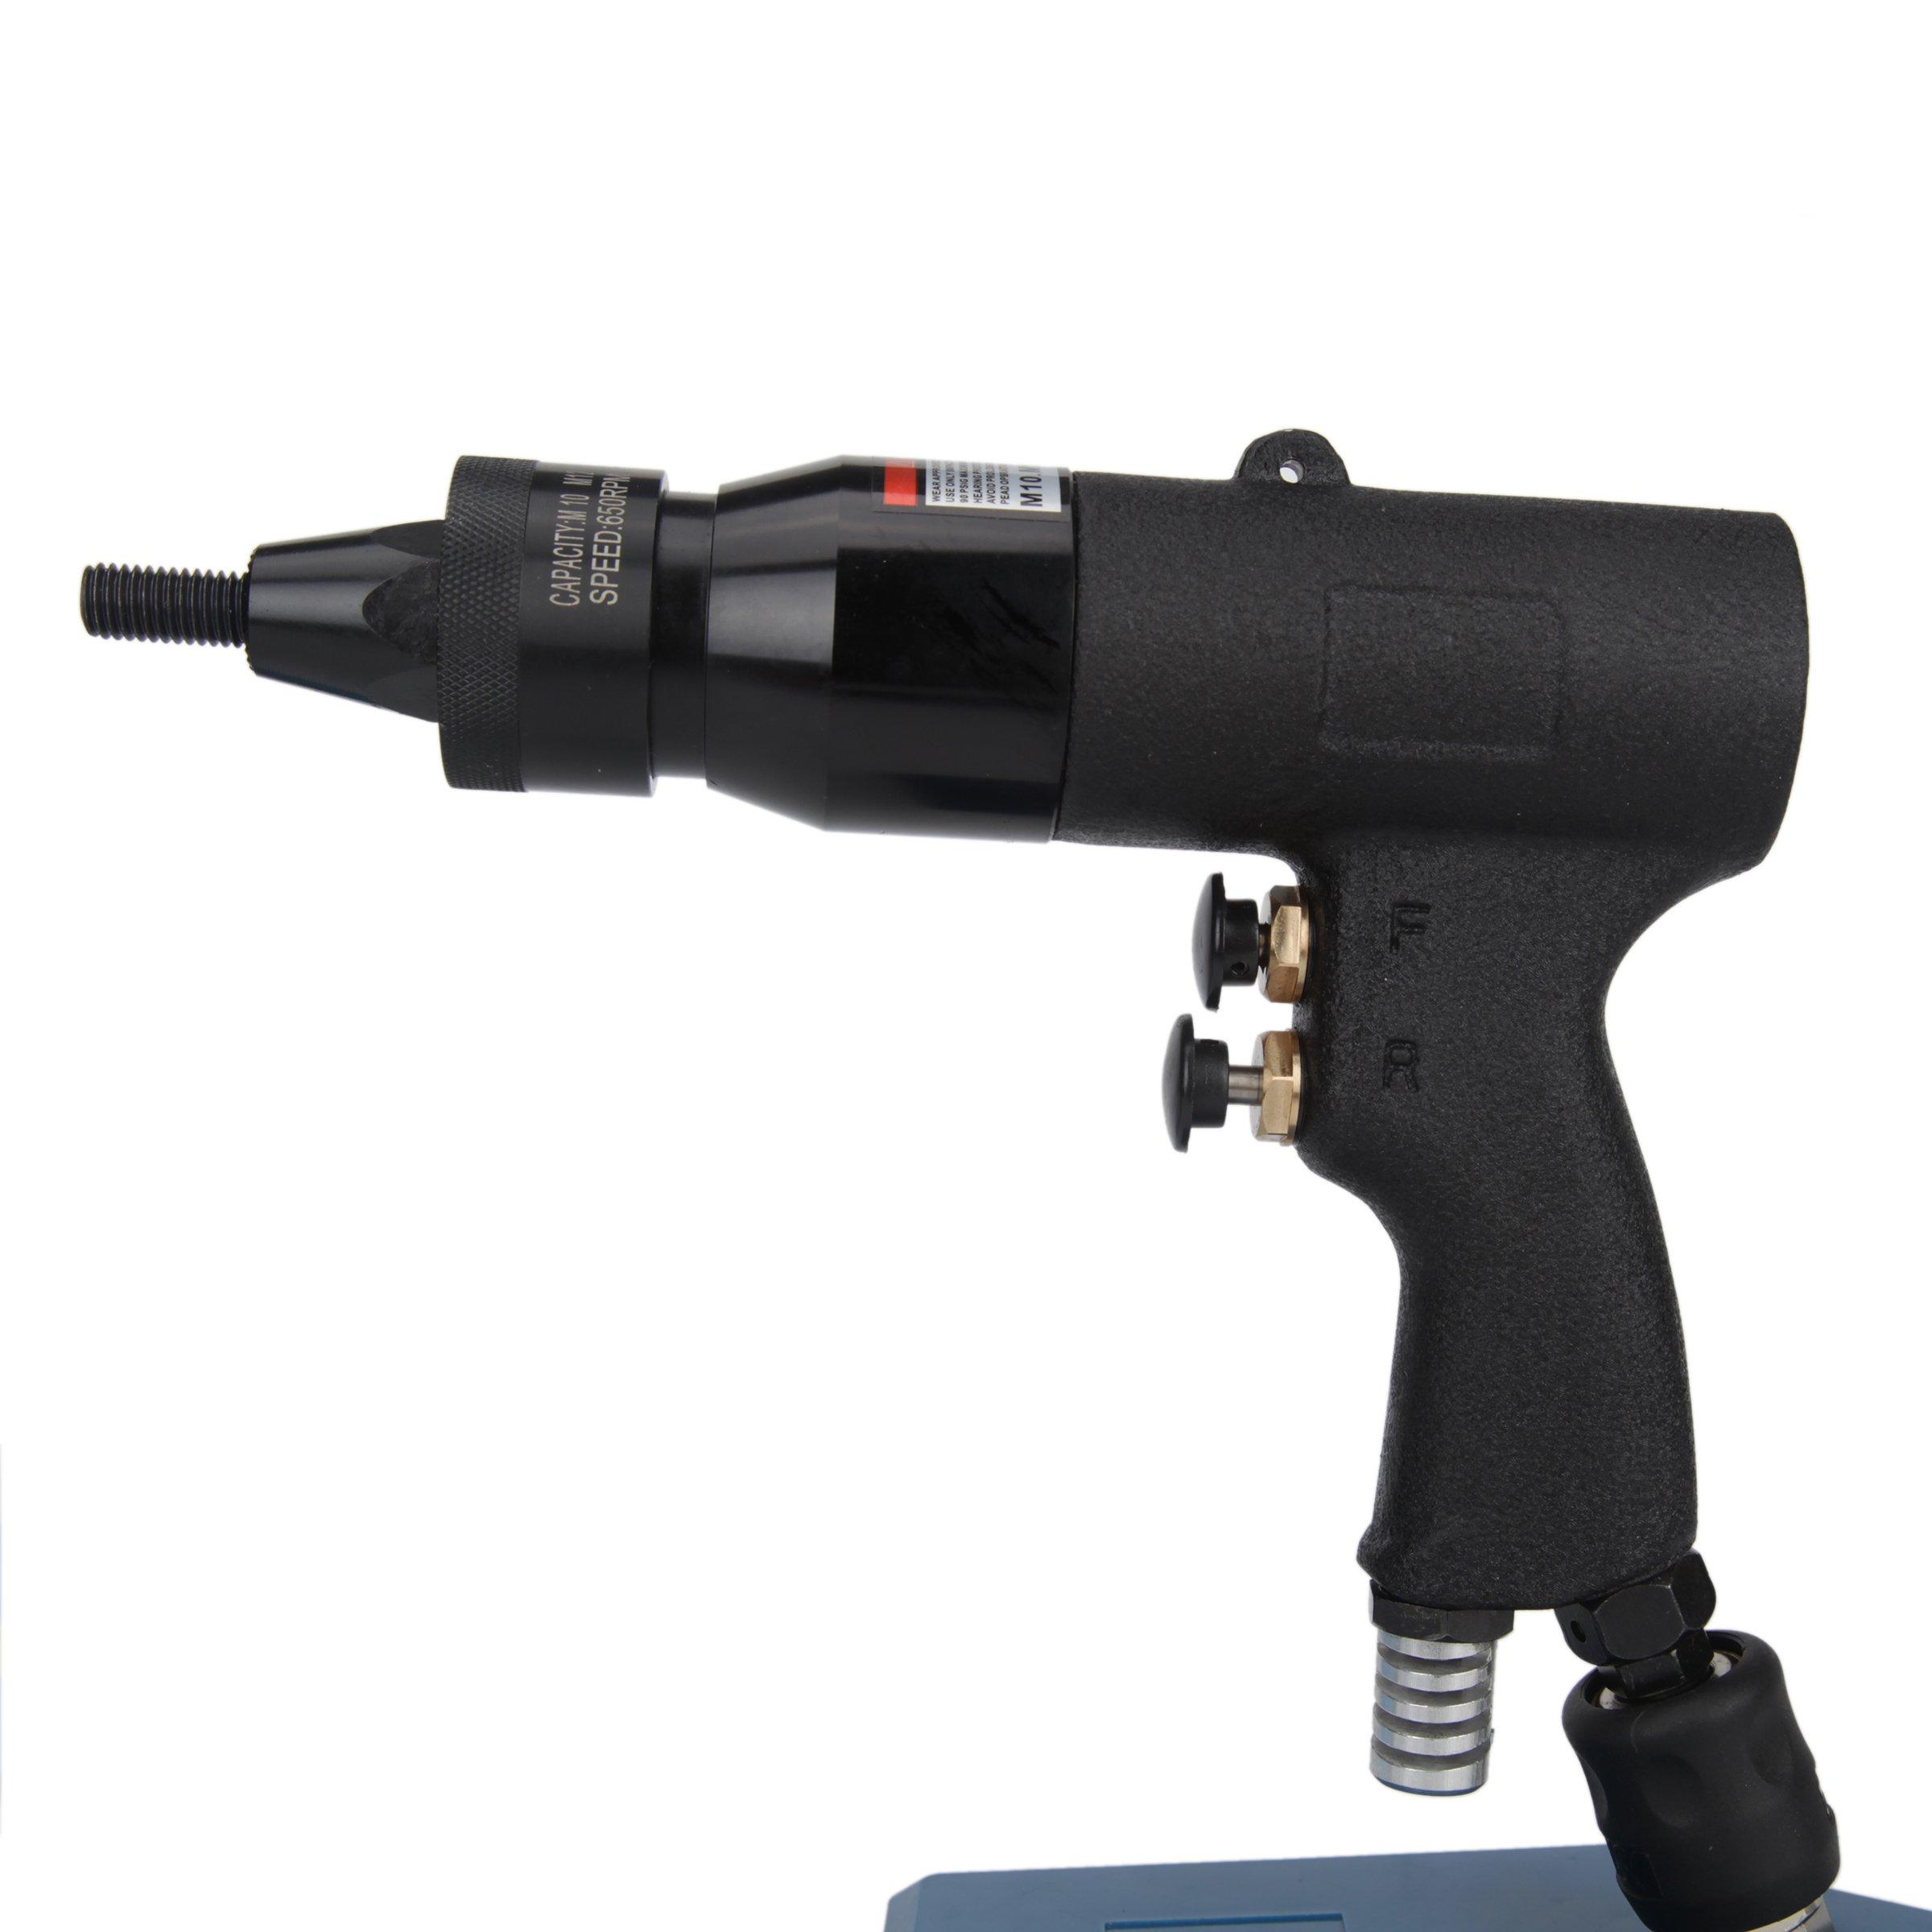 Ouya 1114 Pneumatic Riveter Pull Setter Gun M10-M12 with 600RPM for Aluminum Rivet Nuts